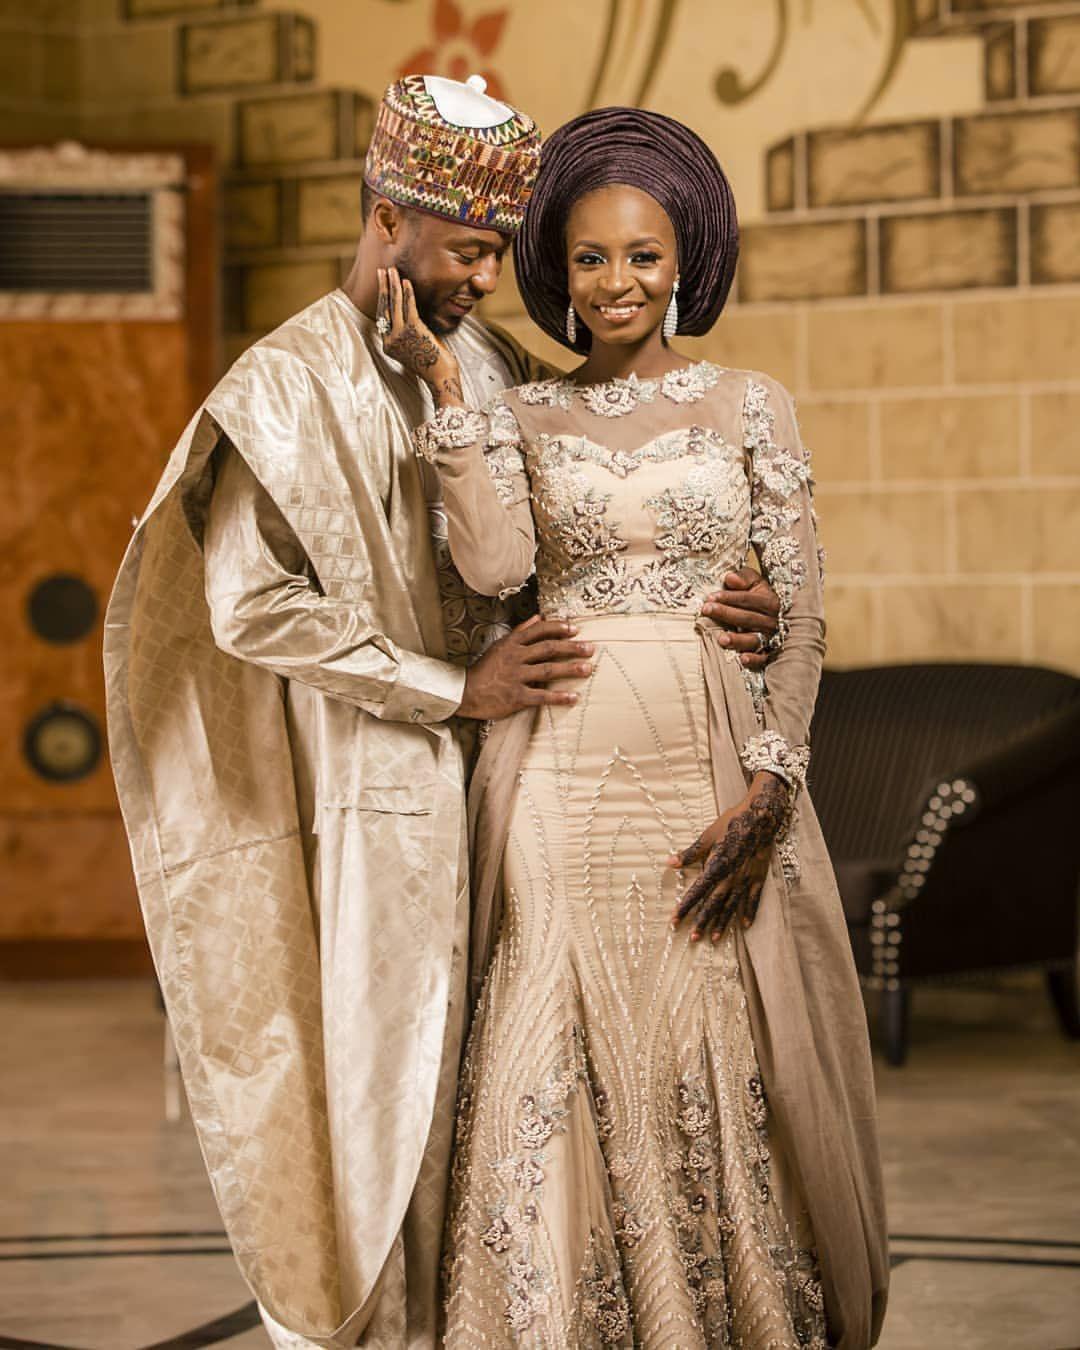 Pin By Joypat On African Couture Dress African Wedding Attire Traditional Wedding Attire Nigerian Wedding Dress